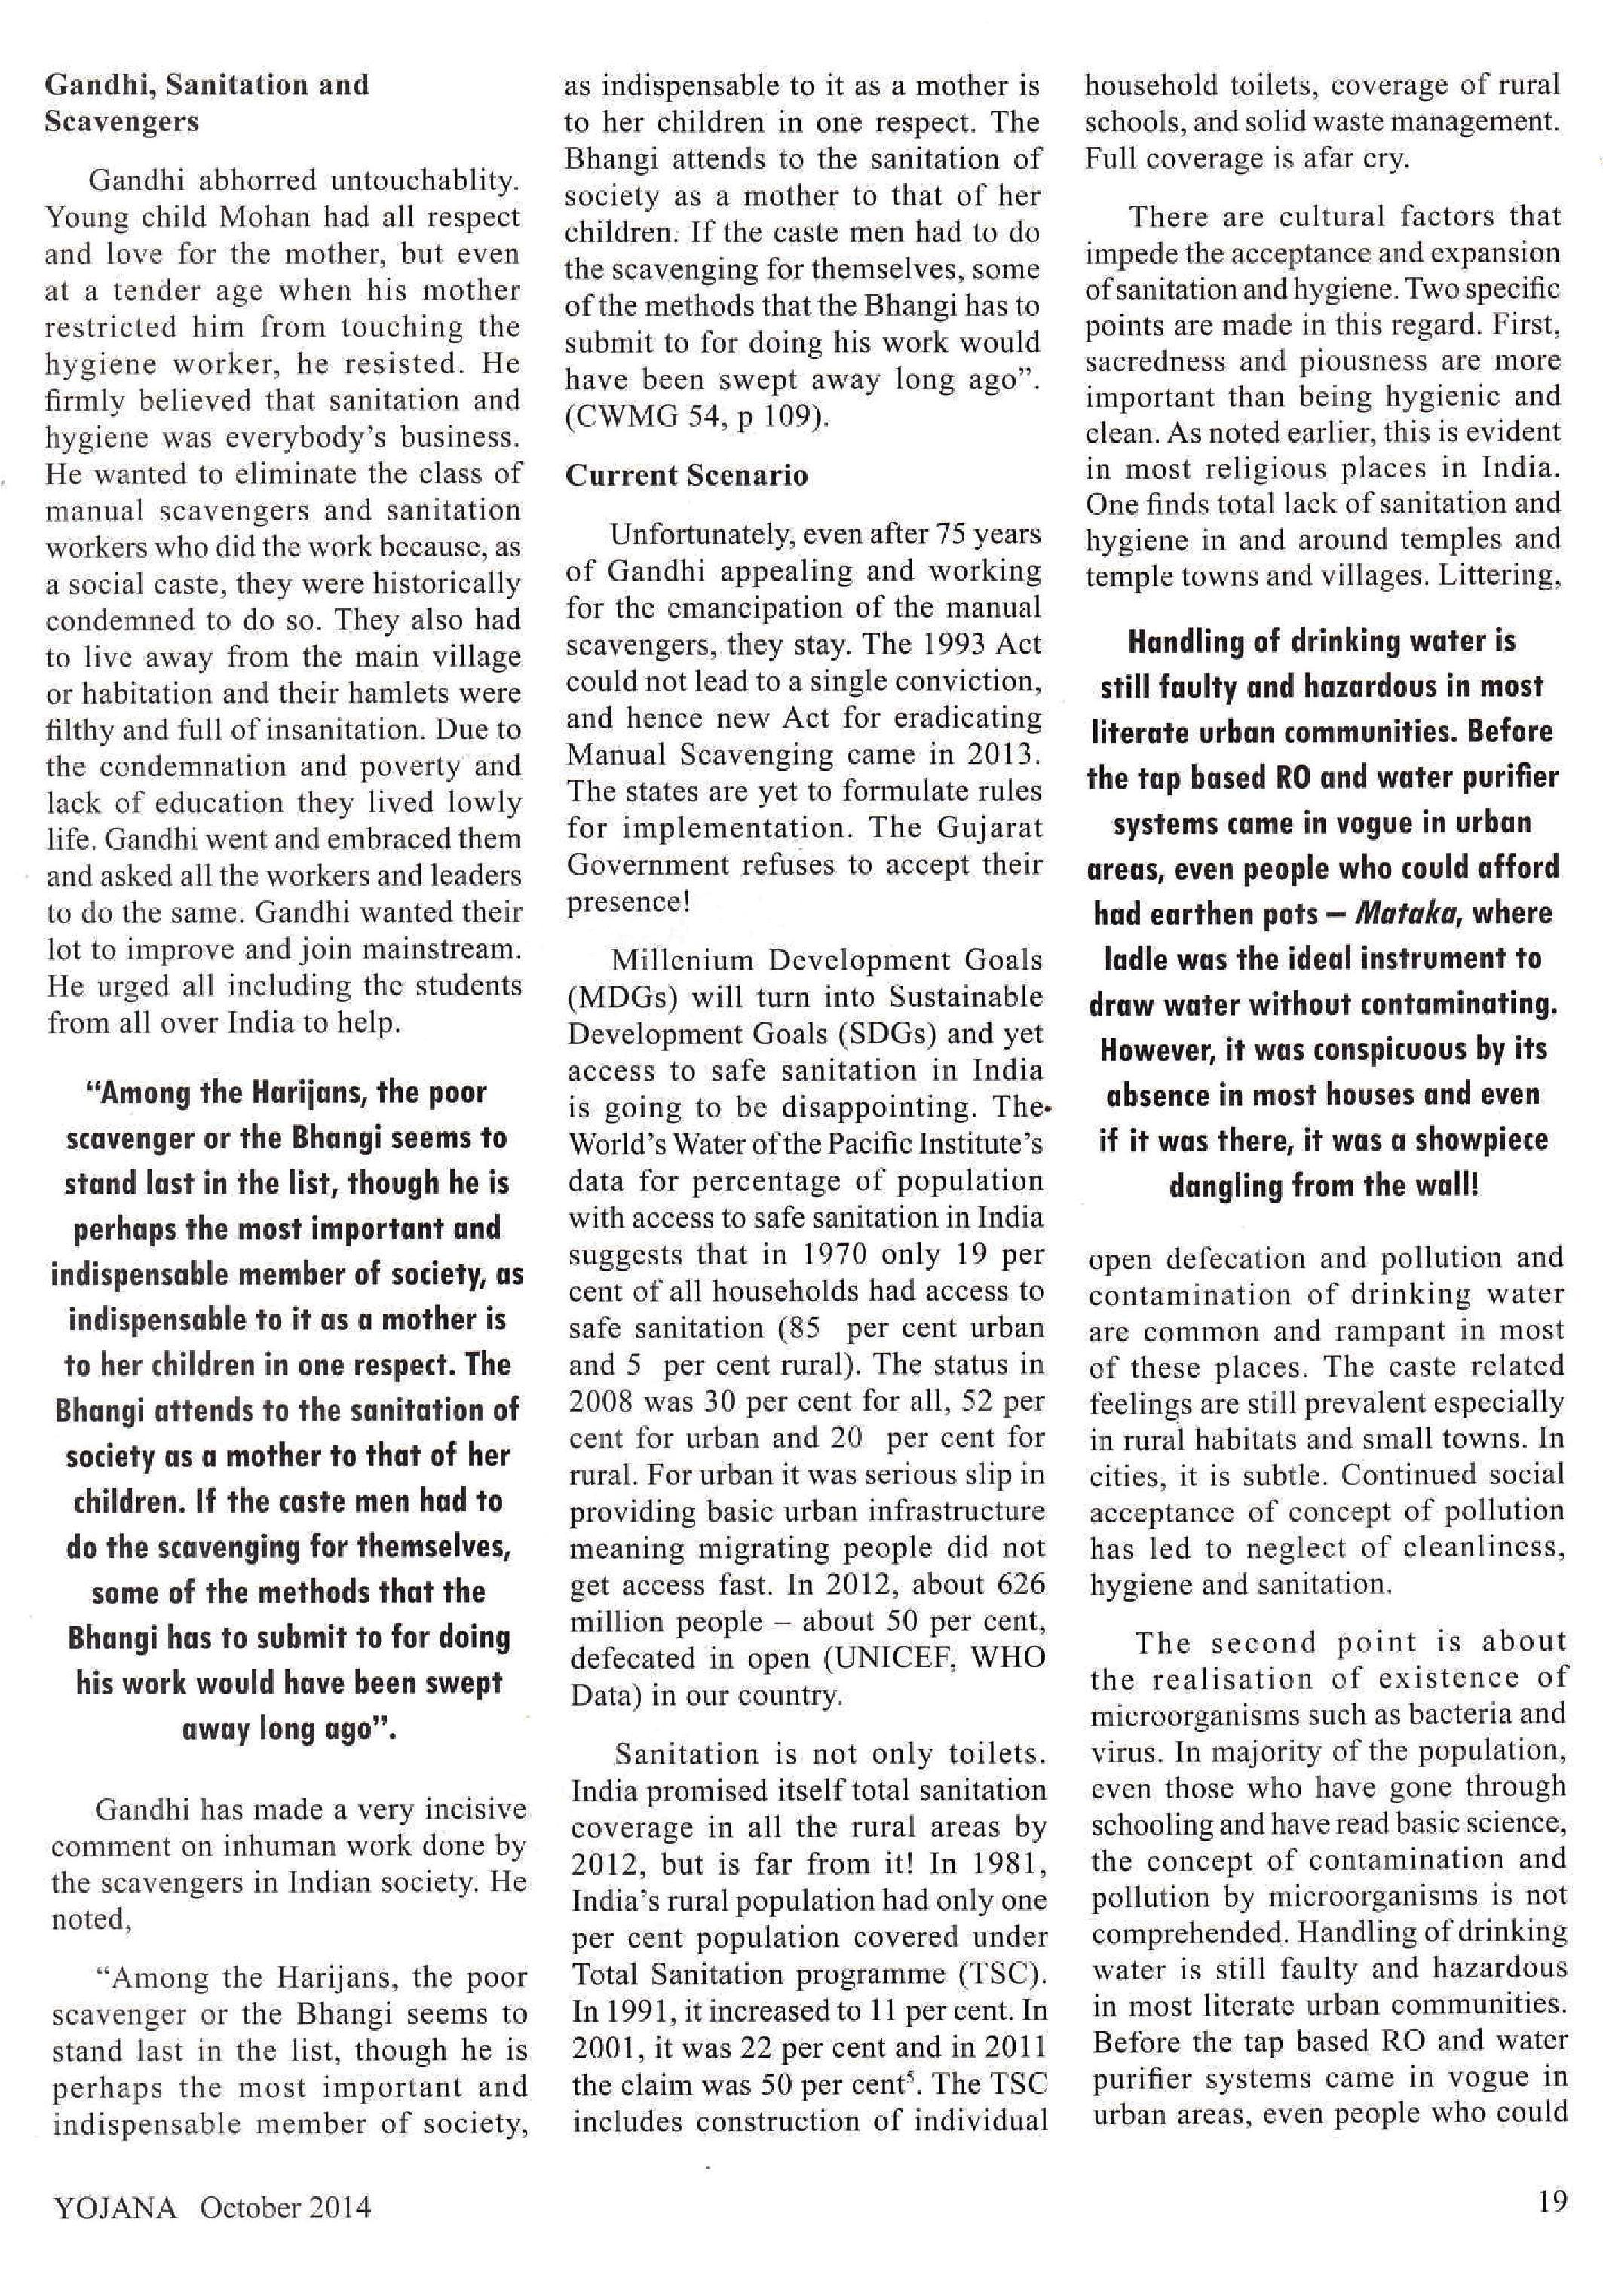 Yojna 1-page-005